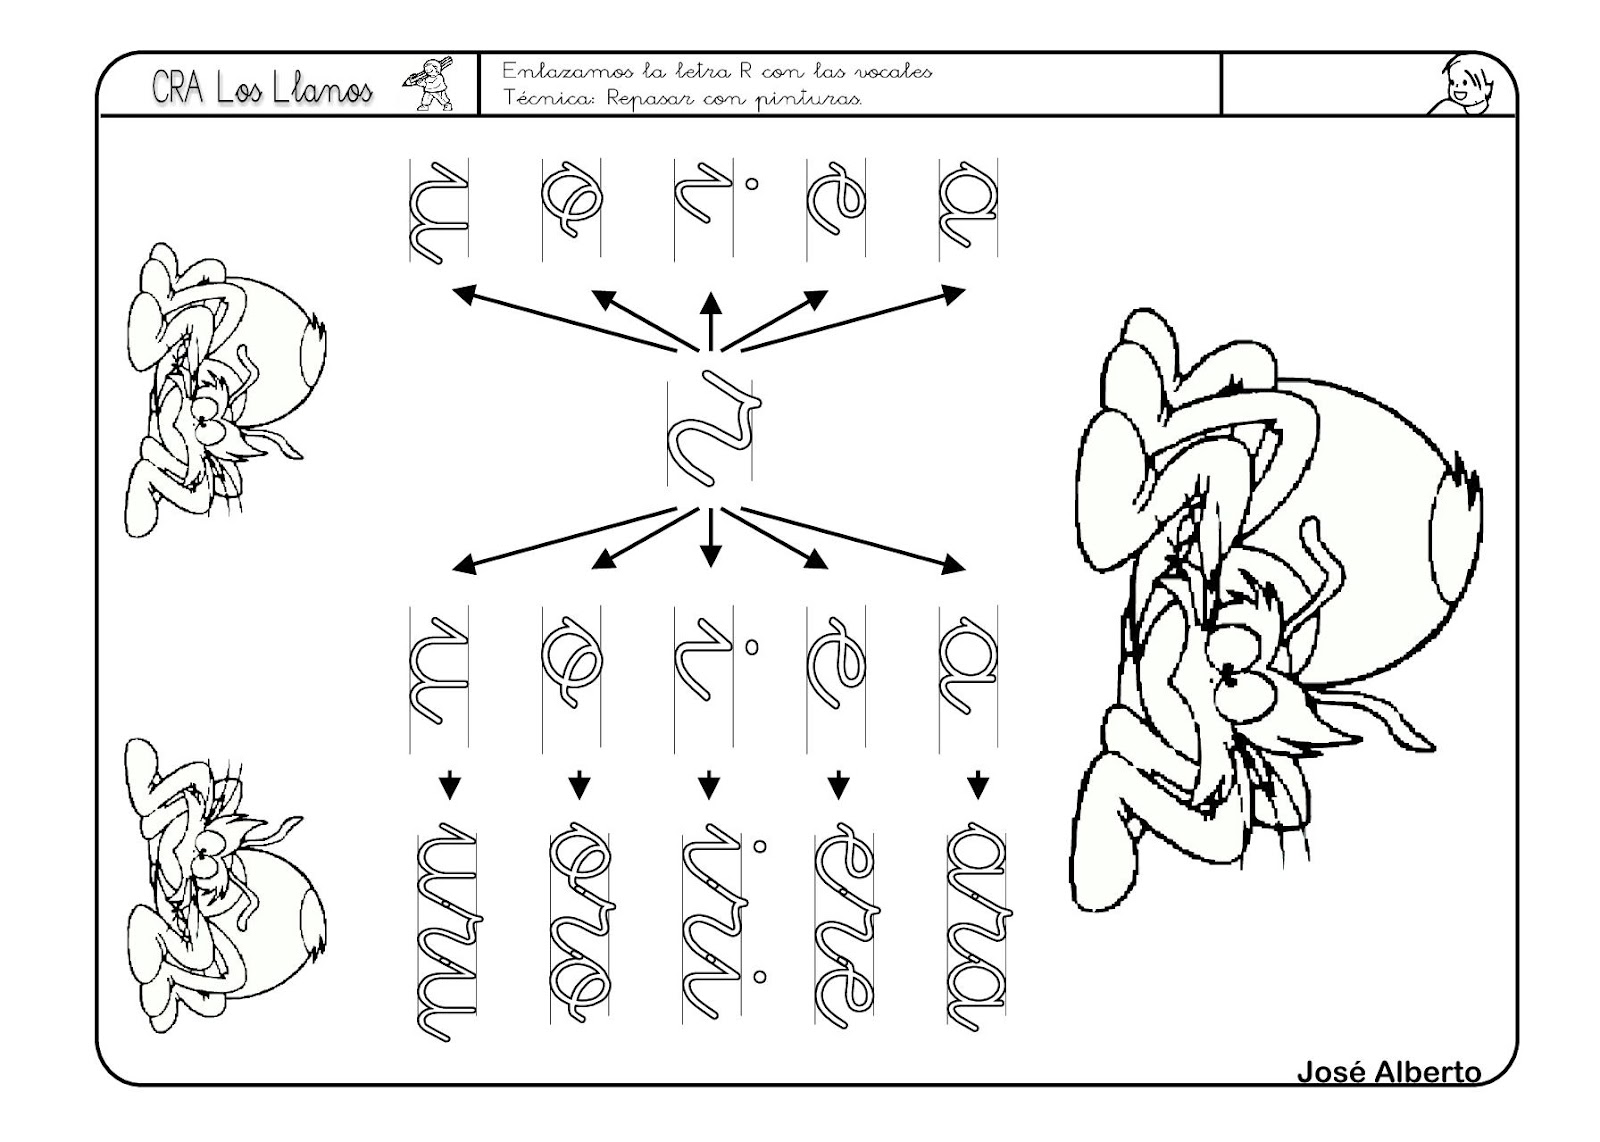 Legrand Wiring Diagram